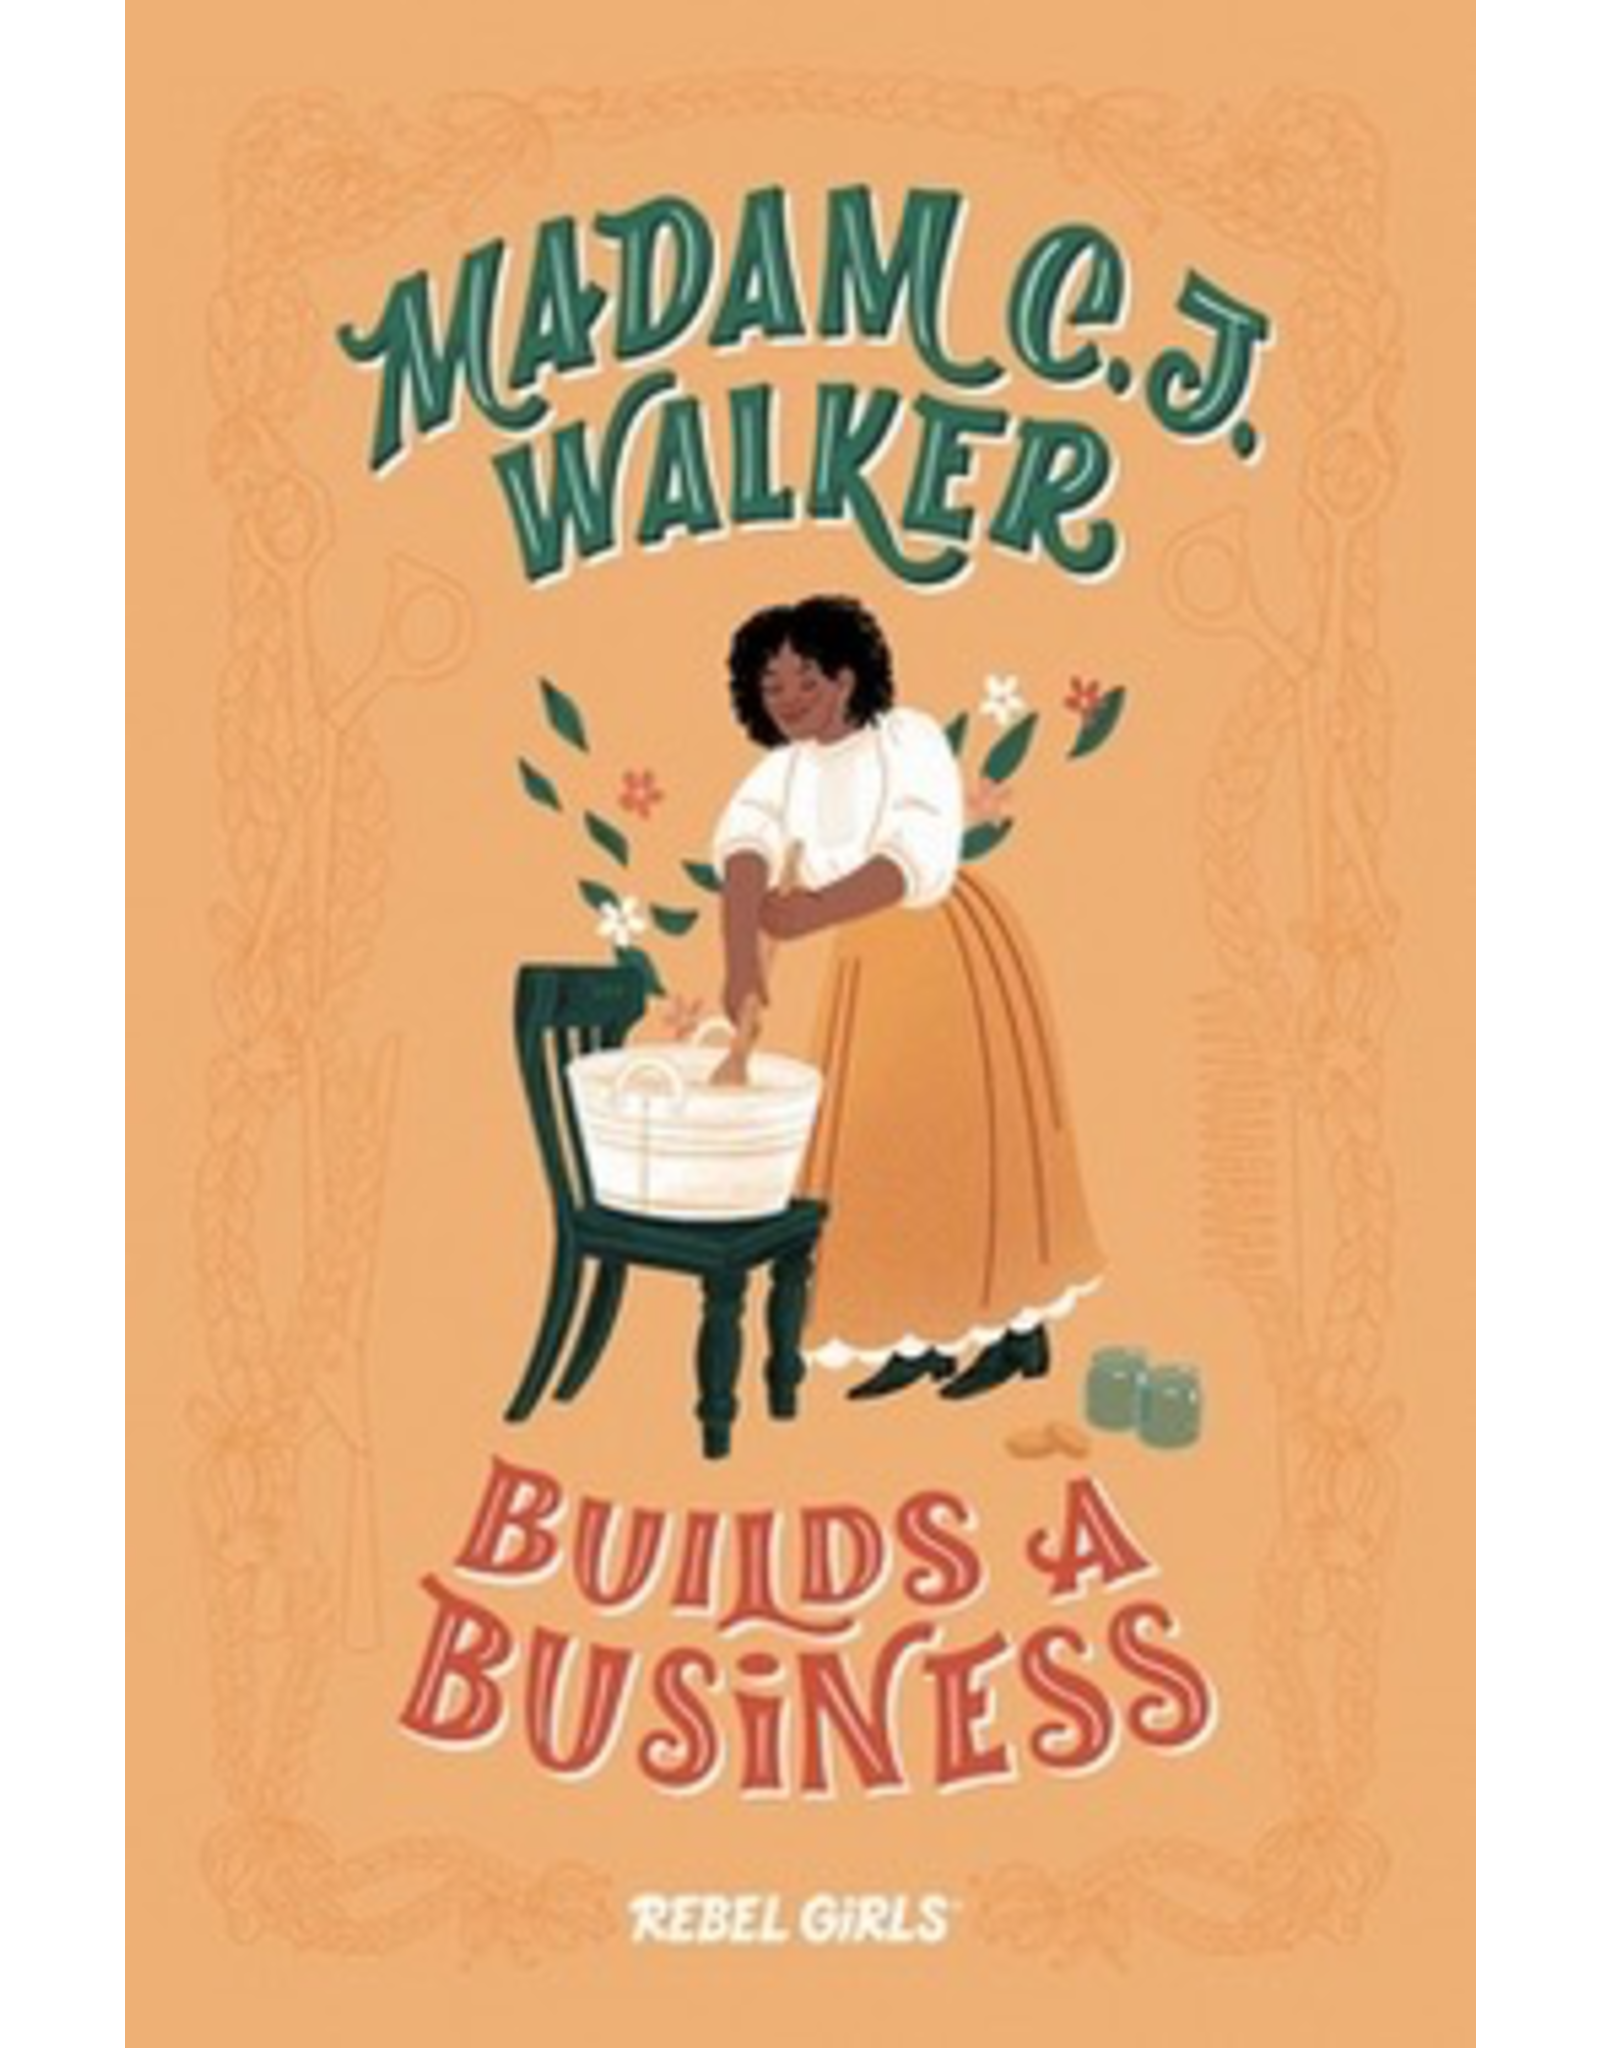 Simon and Schuster Madam Cj Walker